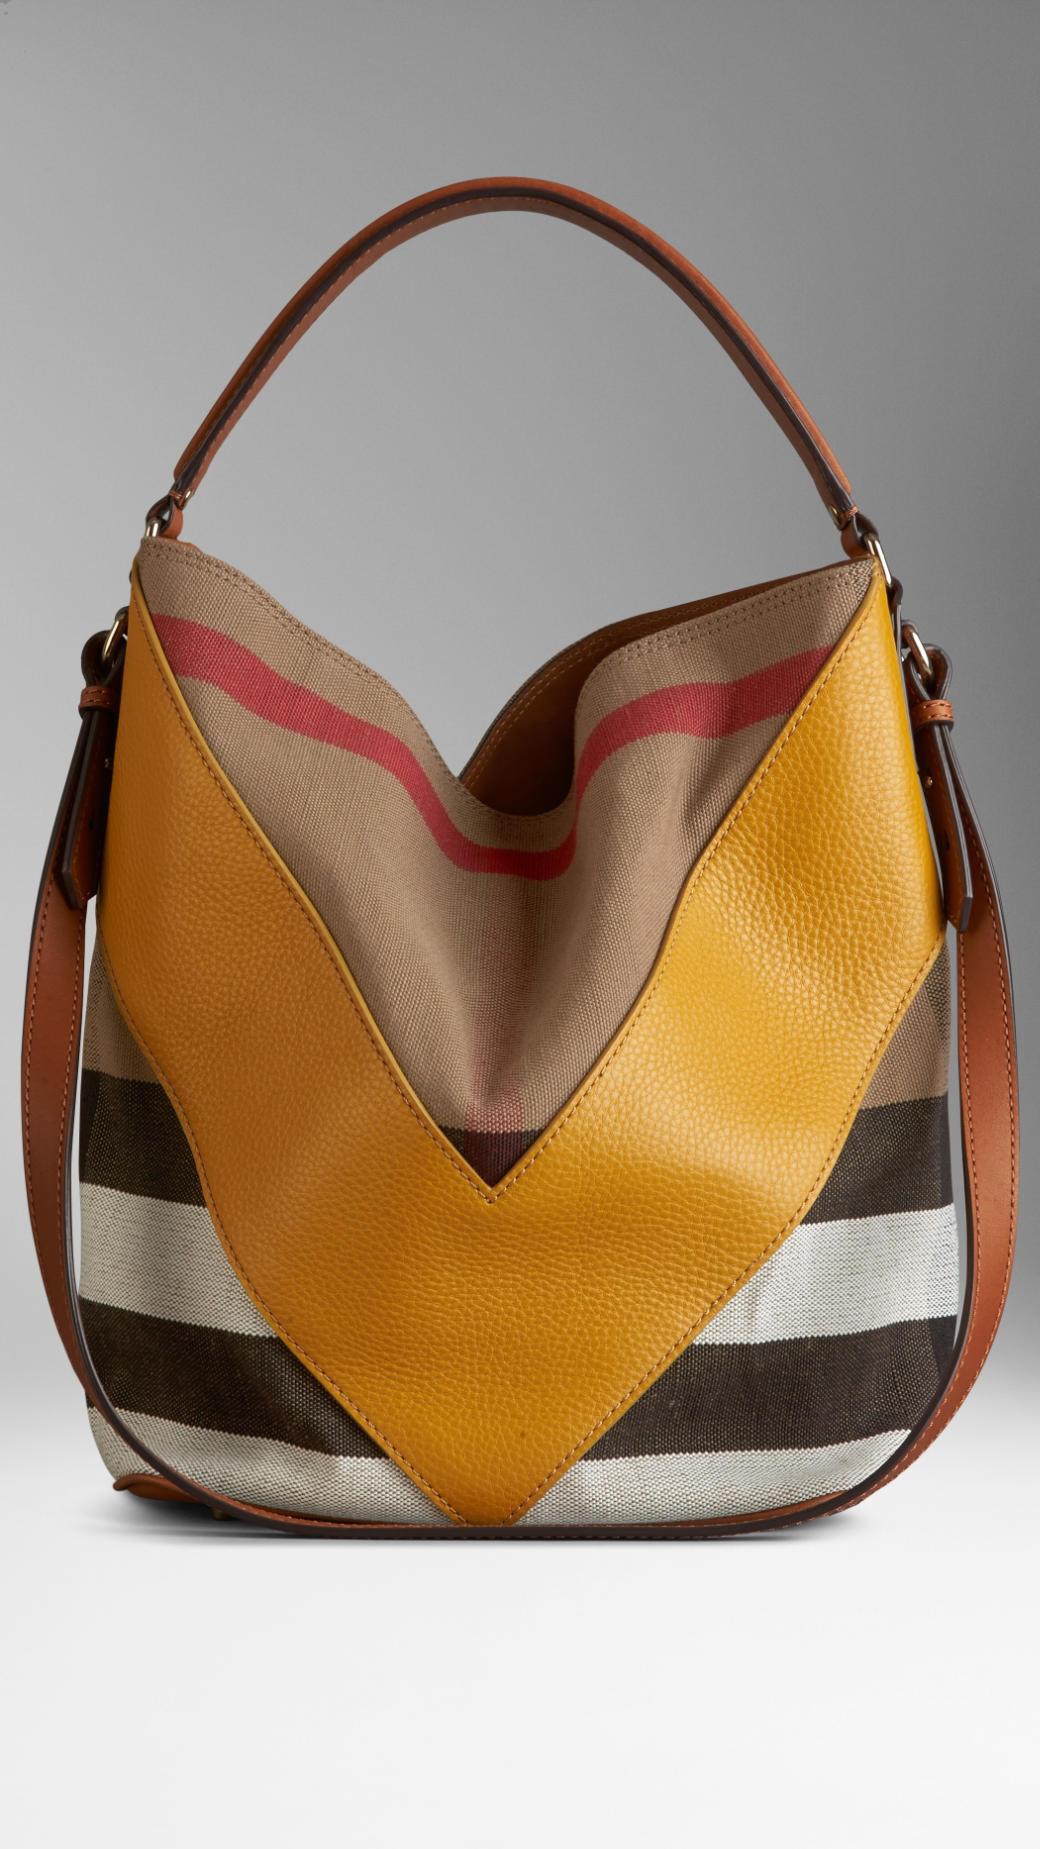 02cc10371403 Lyst - Burberry Medium Leather Chevron Canvas Check Hobo Bag